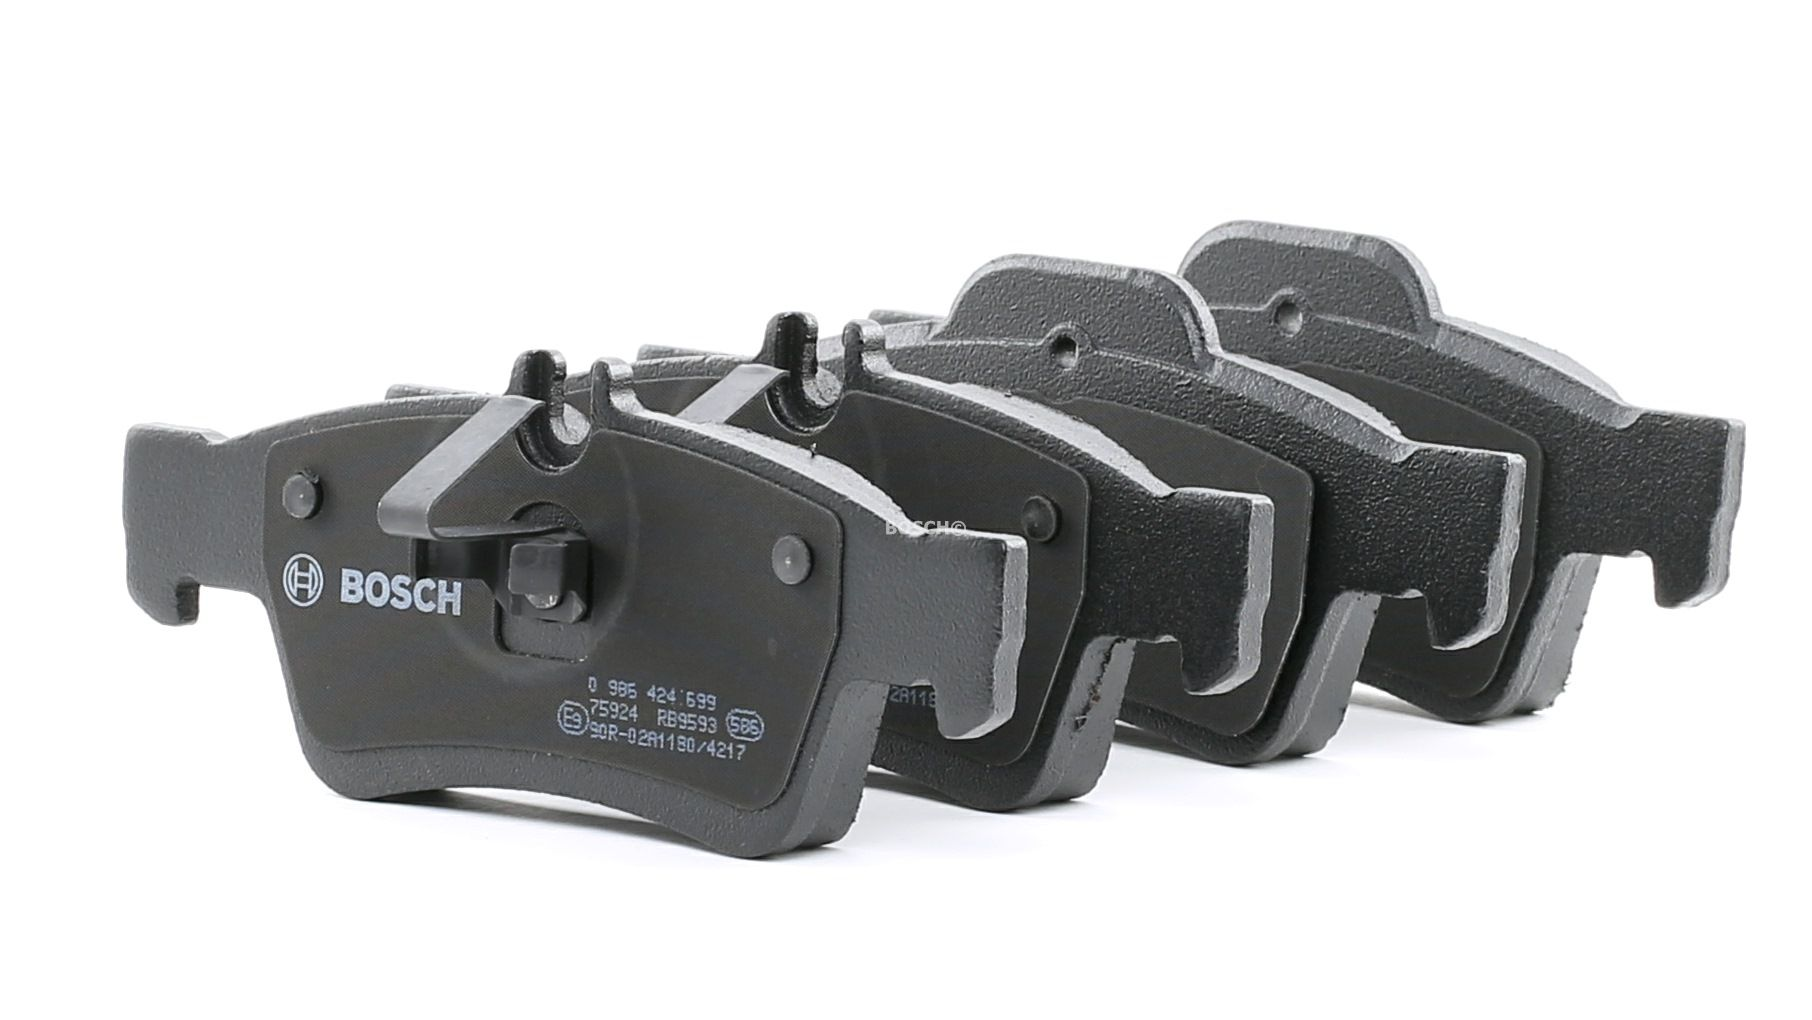 MERCEDES-BENZ CLS 2012 Bremsbeläge - Original BOSCH 0 986 424 699 Höhe 1: 57,3mm, Höhe 2: 59,4mm, Höhe: 57,3mm, Breite 1: 140,1mm, Breite 2: 141,2mm, Dicke/Stärke: 15,5mm